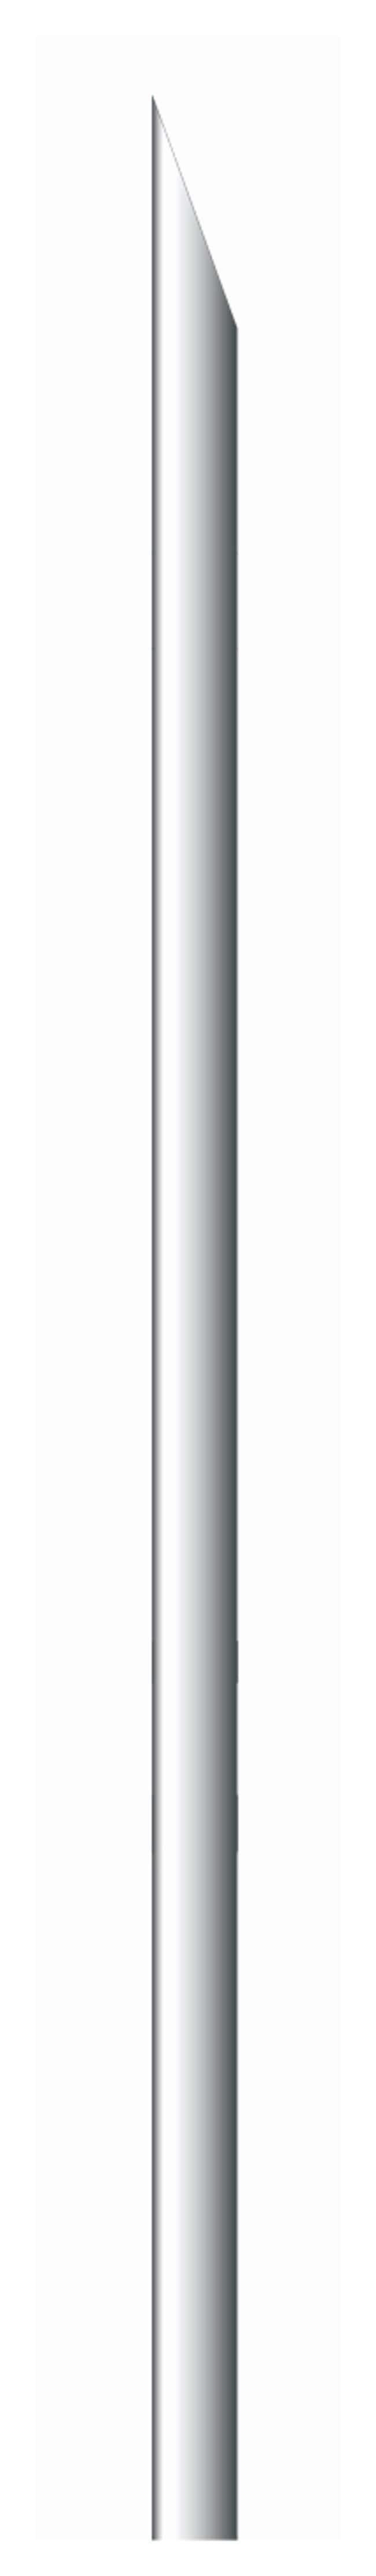 Trajan™Replacement Needles for Luer-Lock Syringes Bevel type tip; Length: 50mm; Gauge: 18; O.D.: 1.27mm; I.D.: 0.8mm Trajan™Replacement Needles for Luer-Lock Syringes